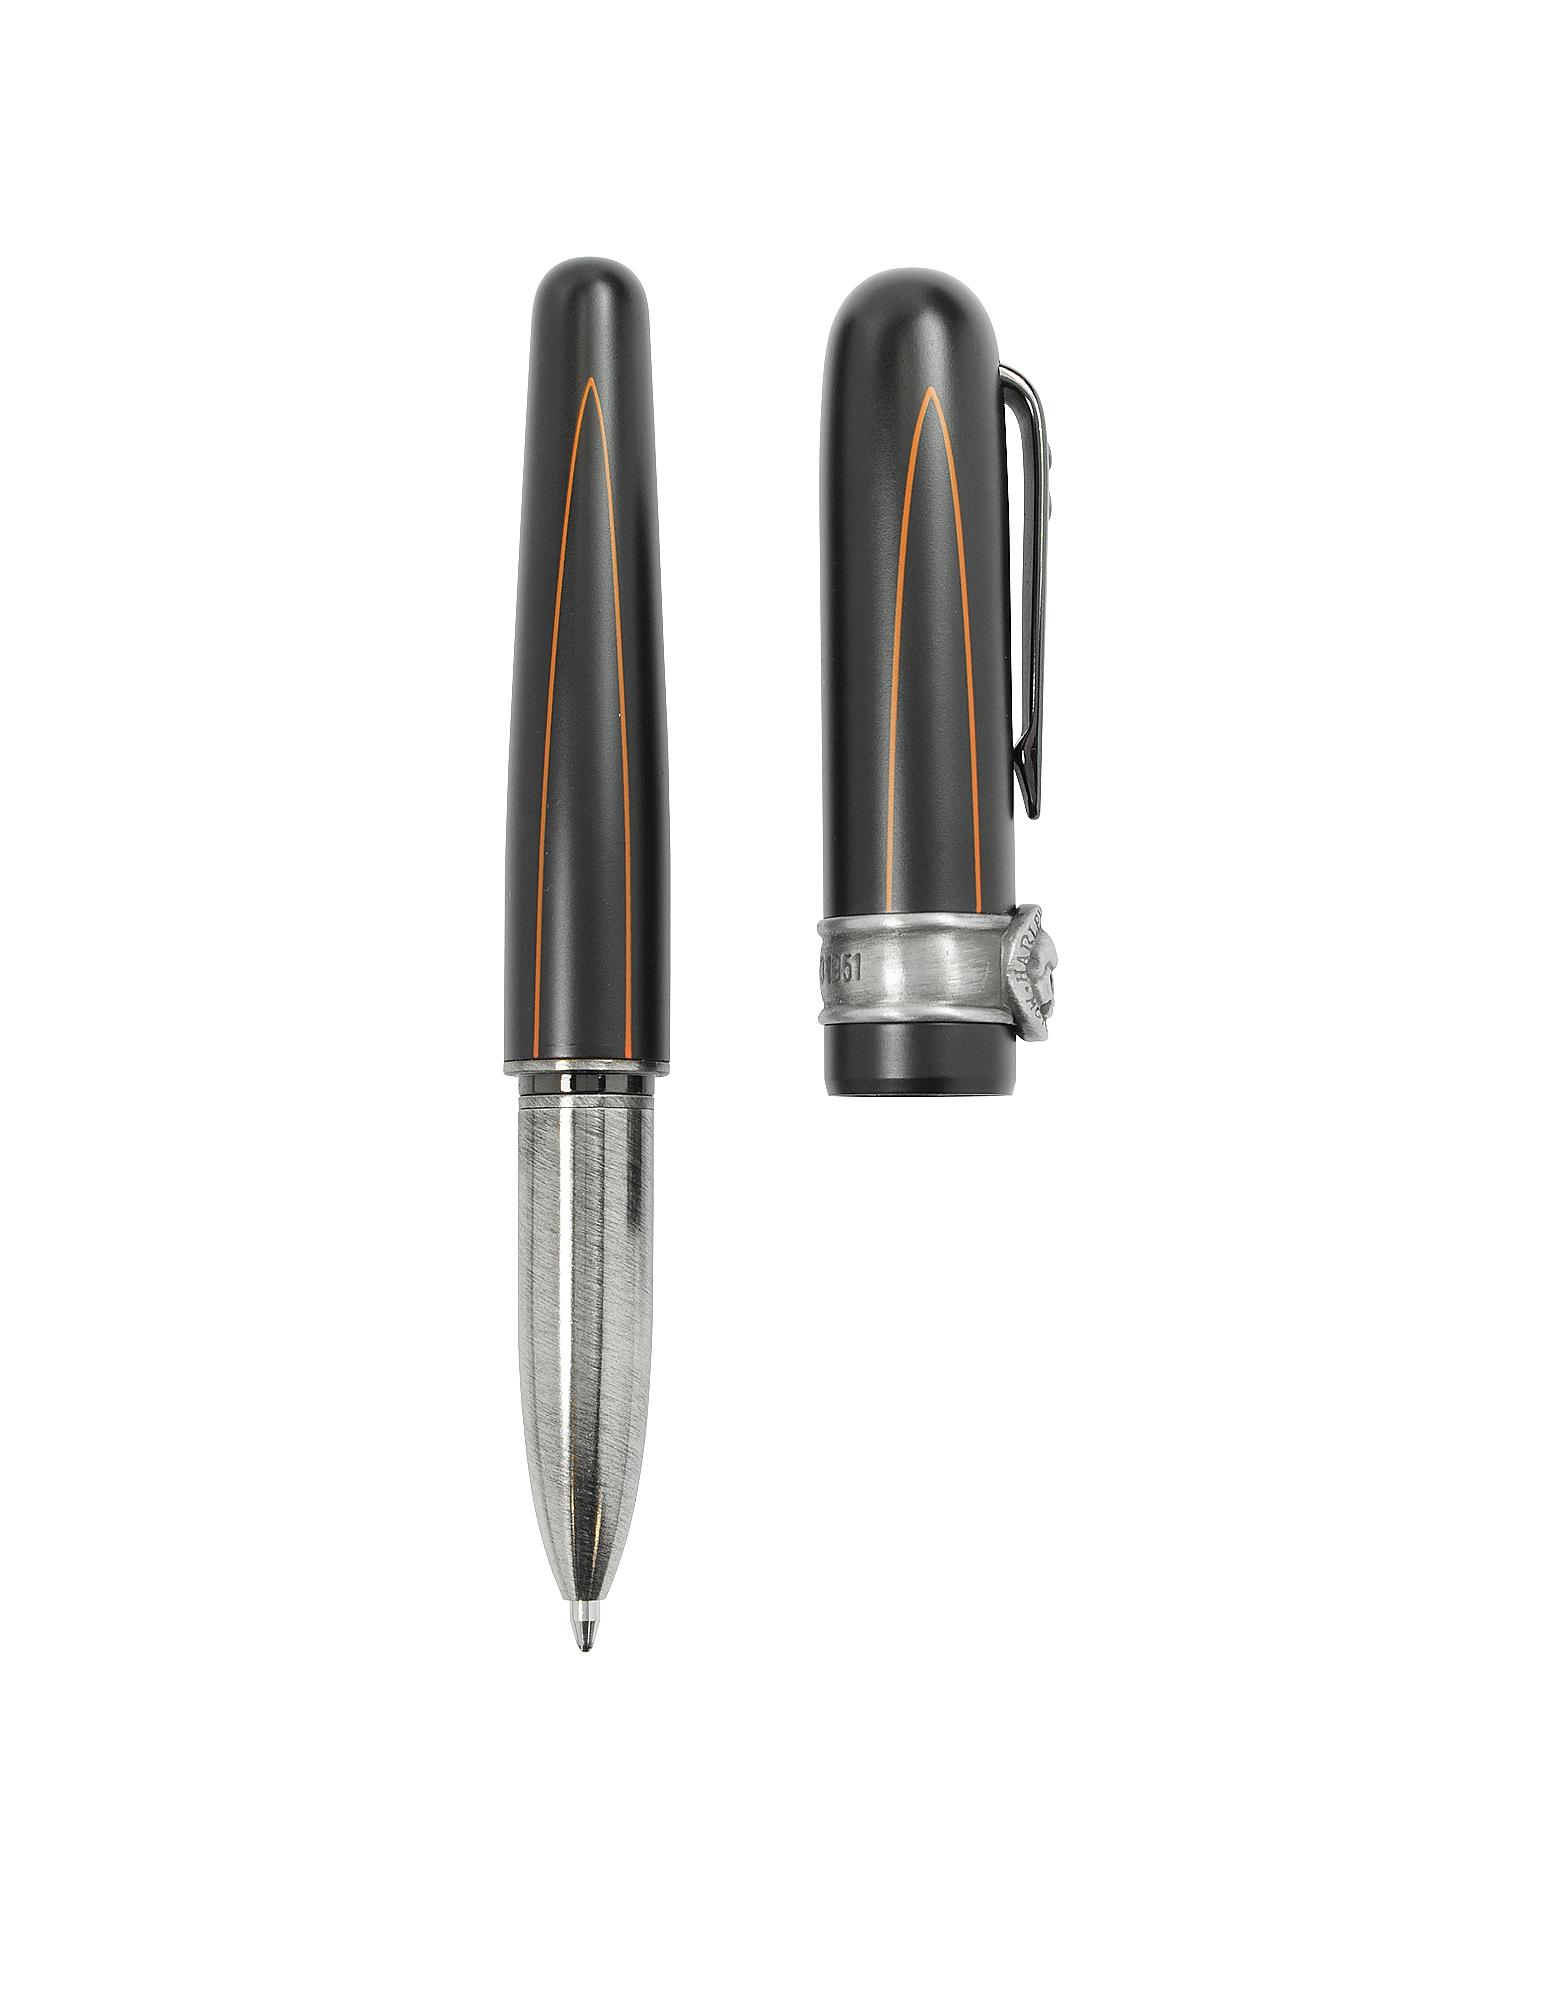 Harley Davidson Writing Instruments, BlackLine Rollerball Pen w/Skull